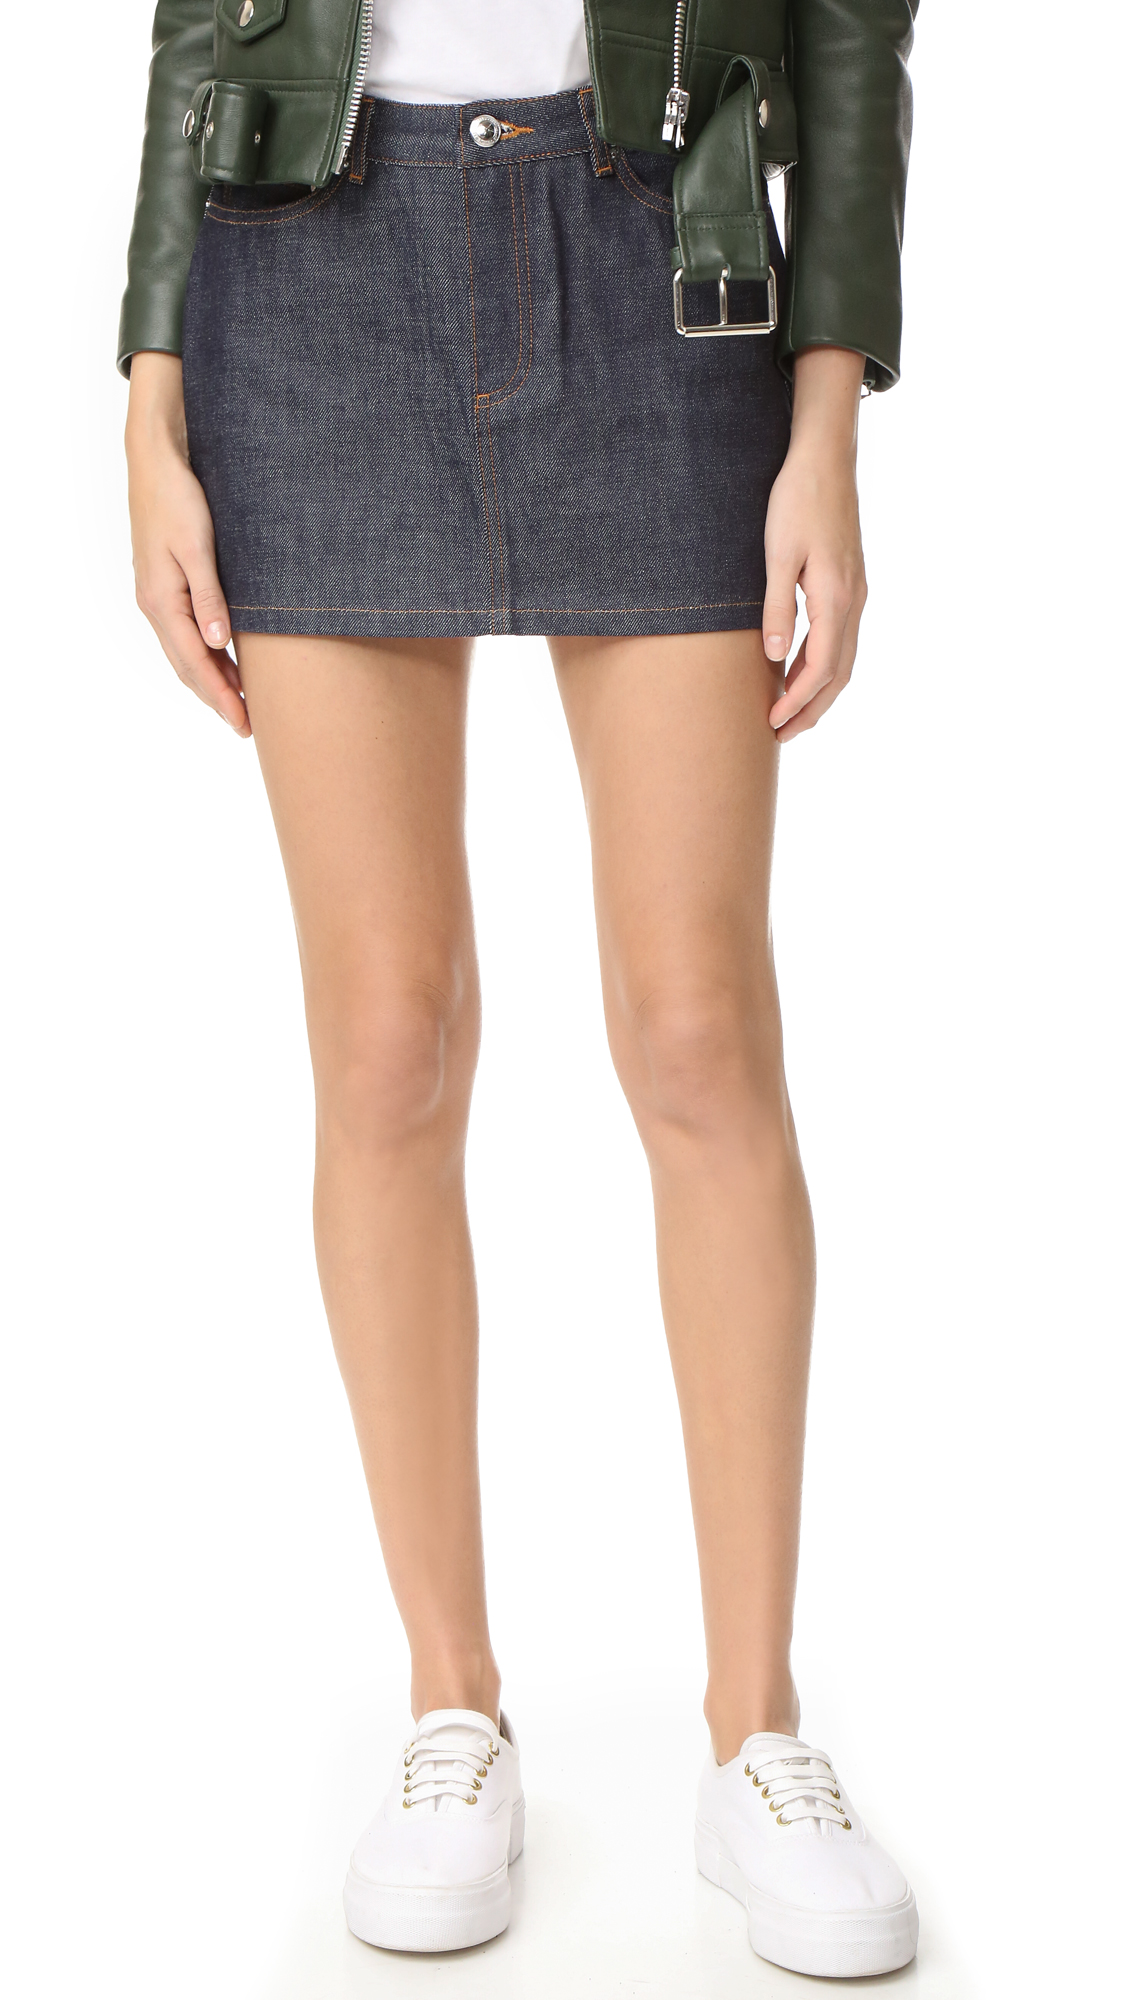 A.P.C. Denim Miniskirt - Indigo Brut at Shopbop